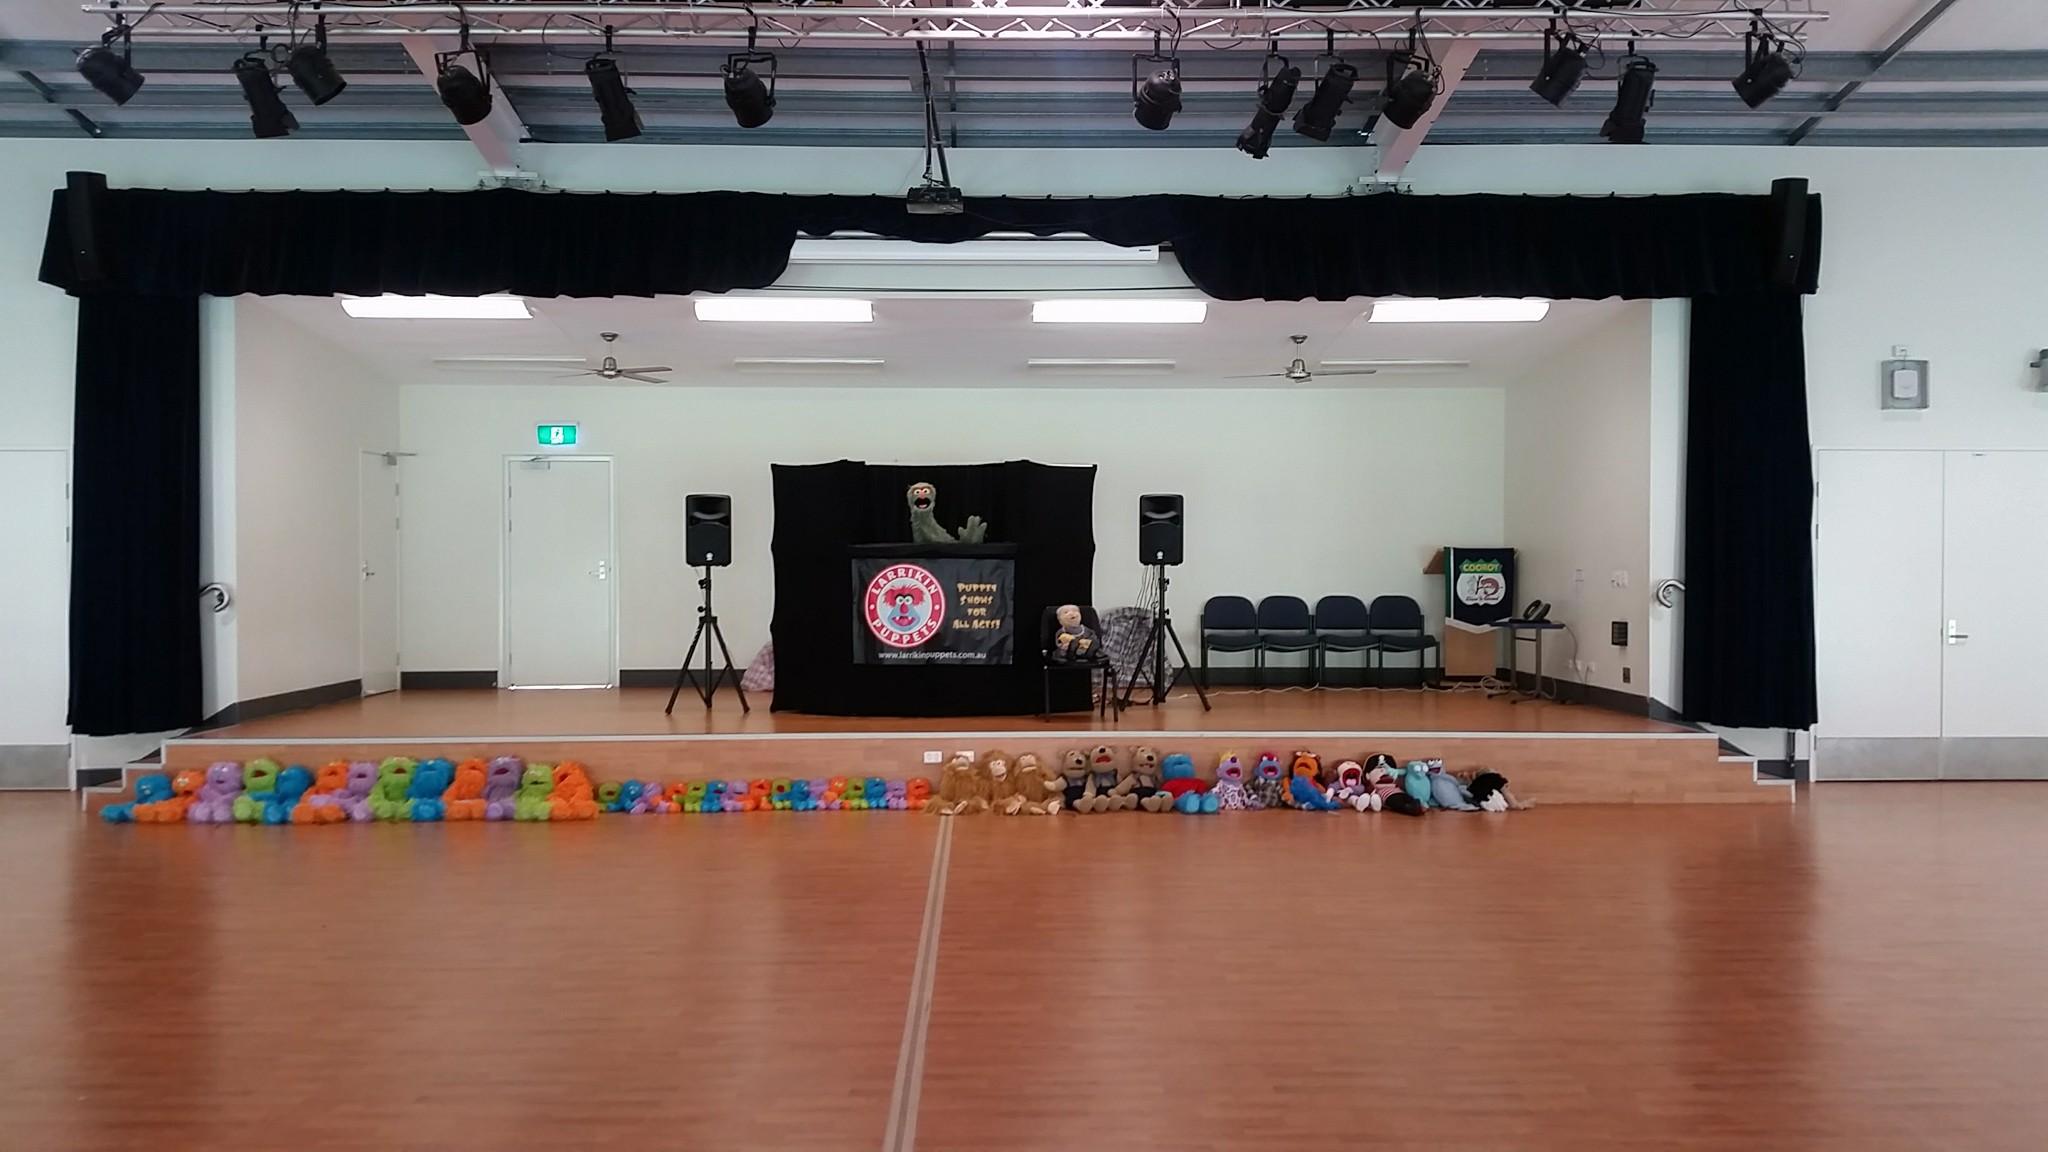 Brisbane Entertainment, Kids Entertainer, Primary Schools | Puppet Shows, Puppetry Workshops - Book Week